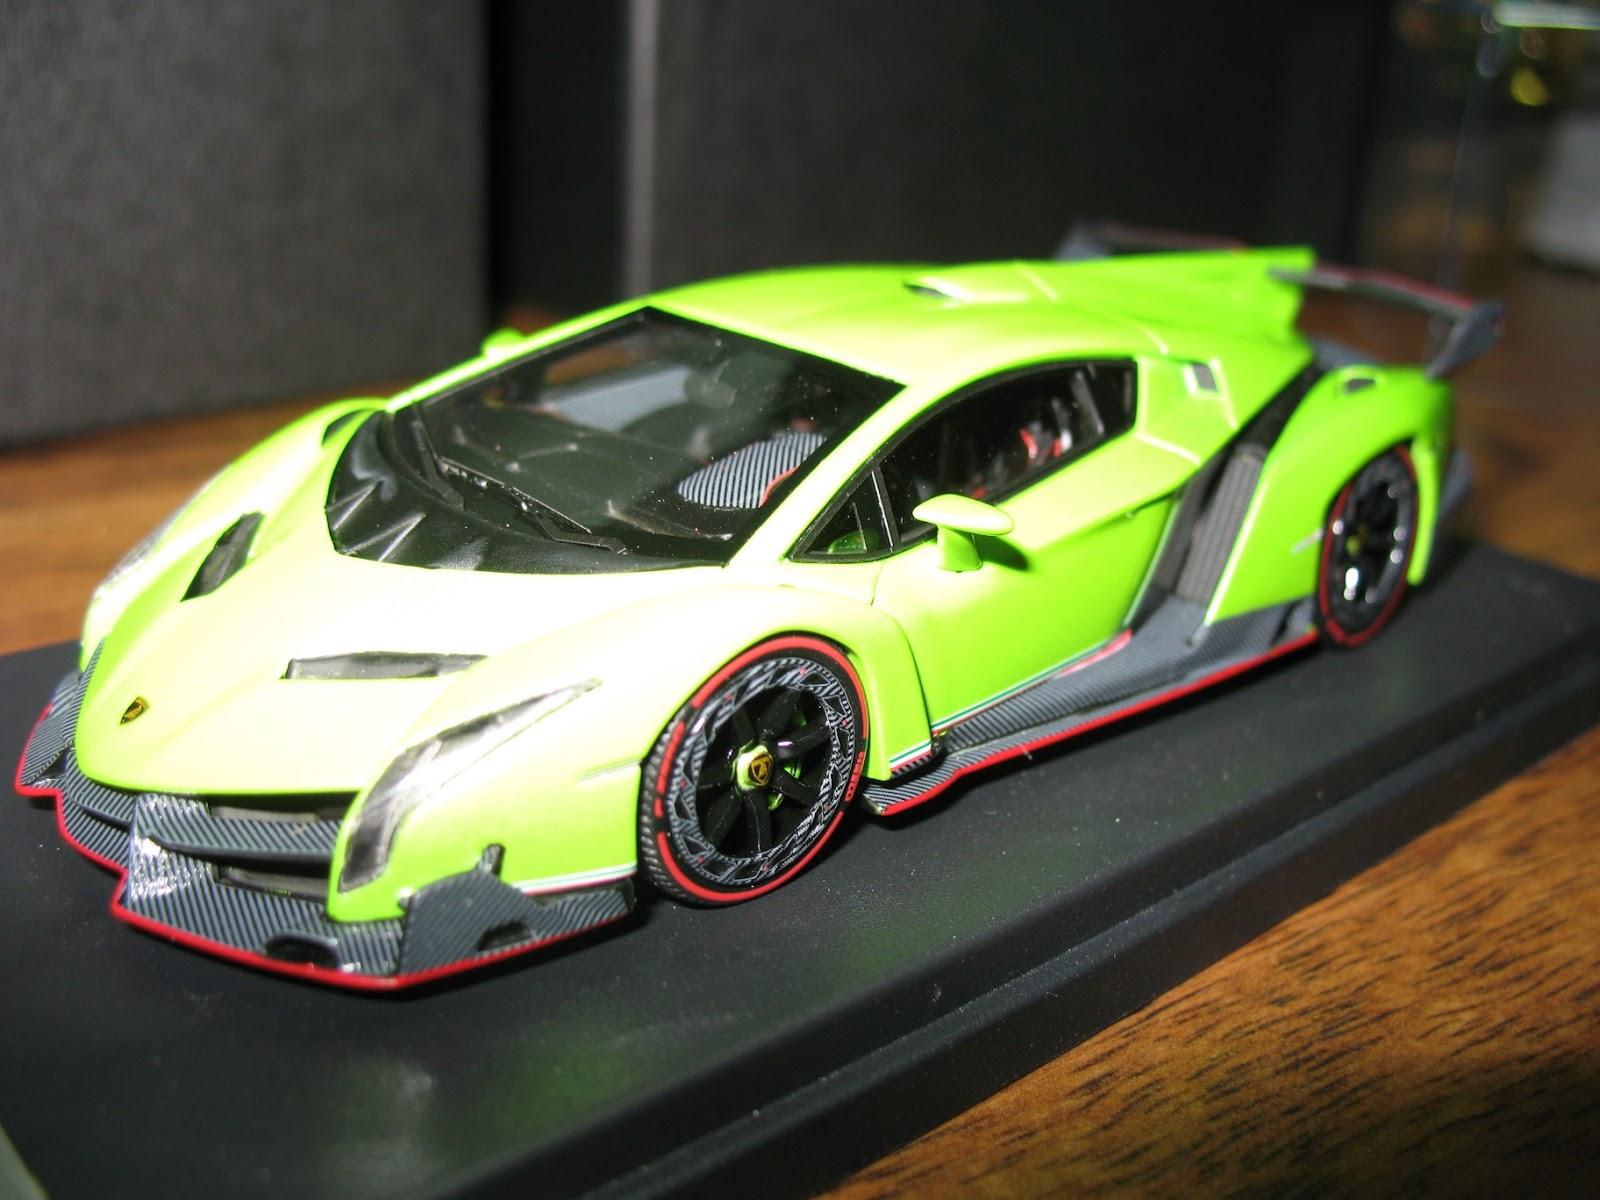 Lego Lamborghini Veneno Pictures To Pin On Pinterest